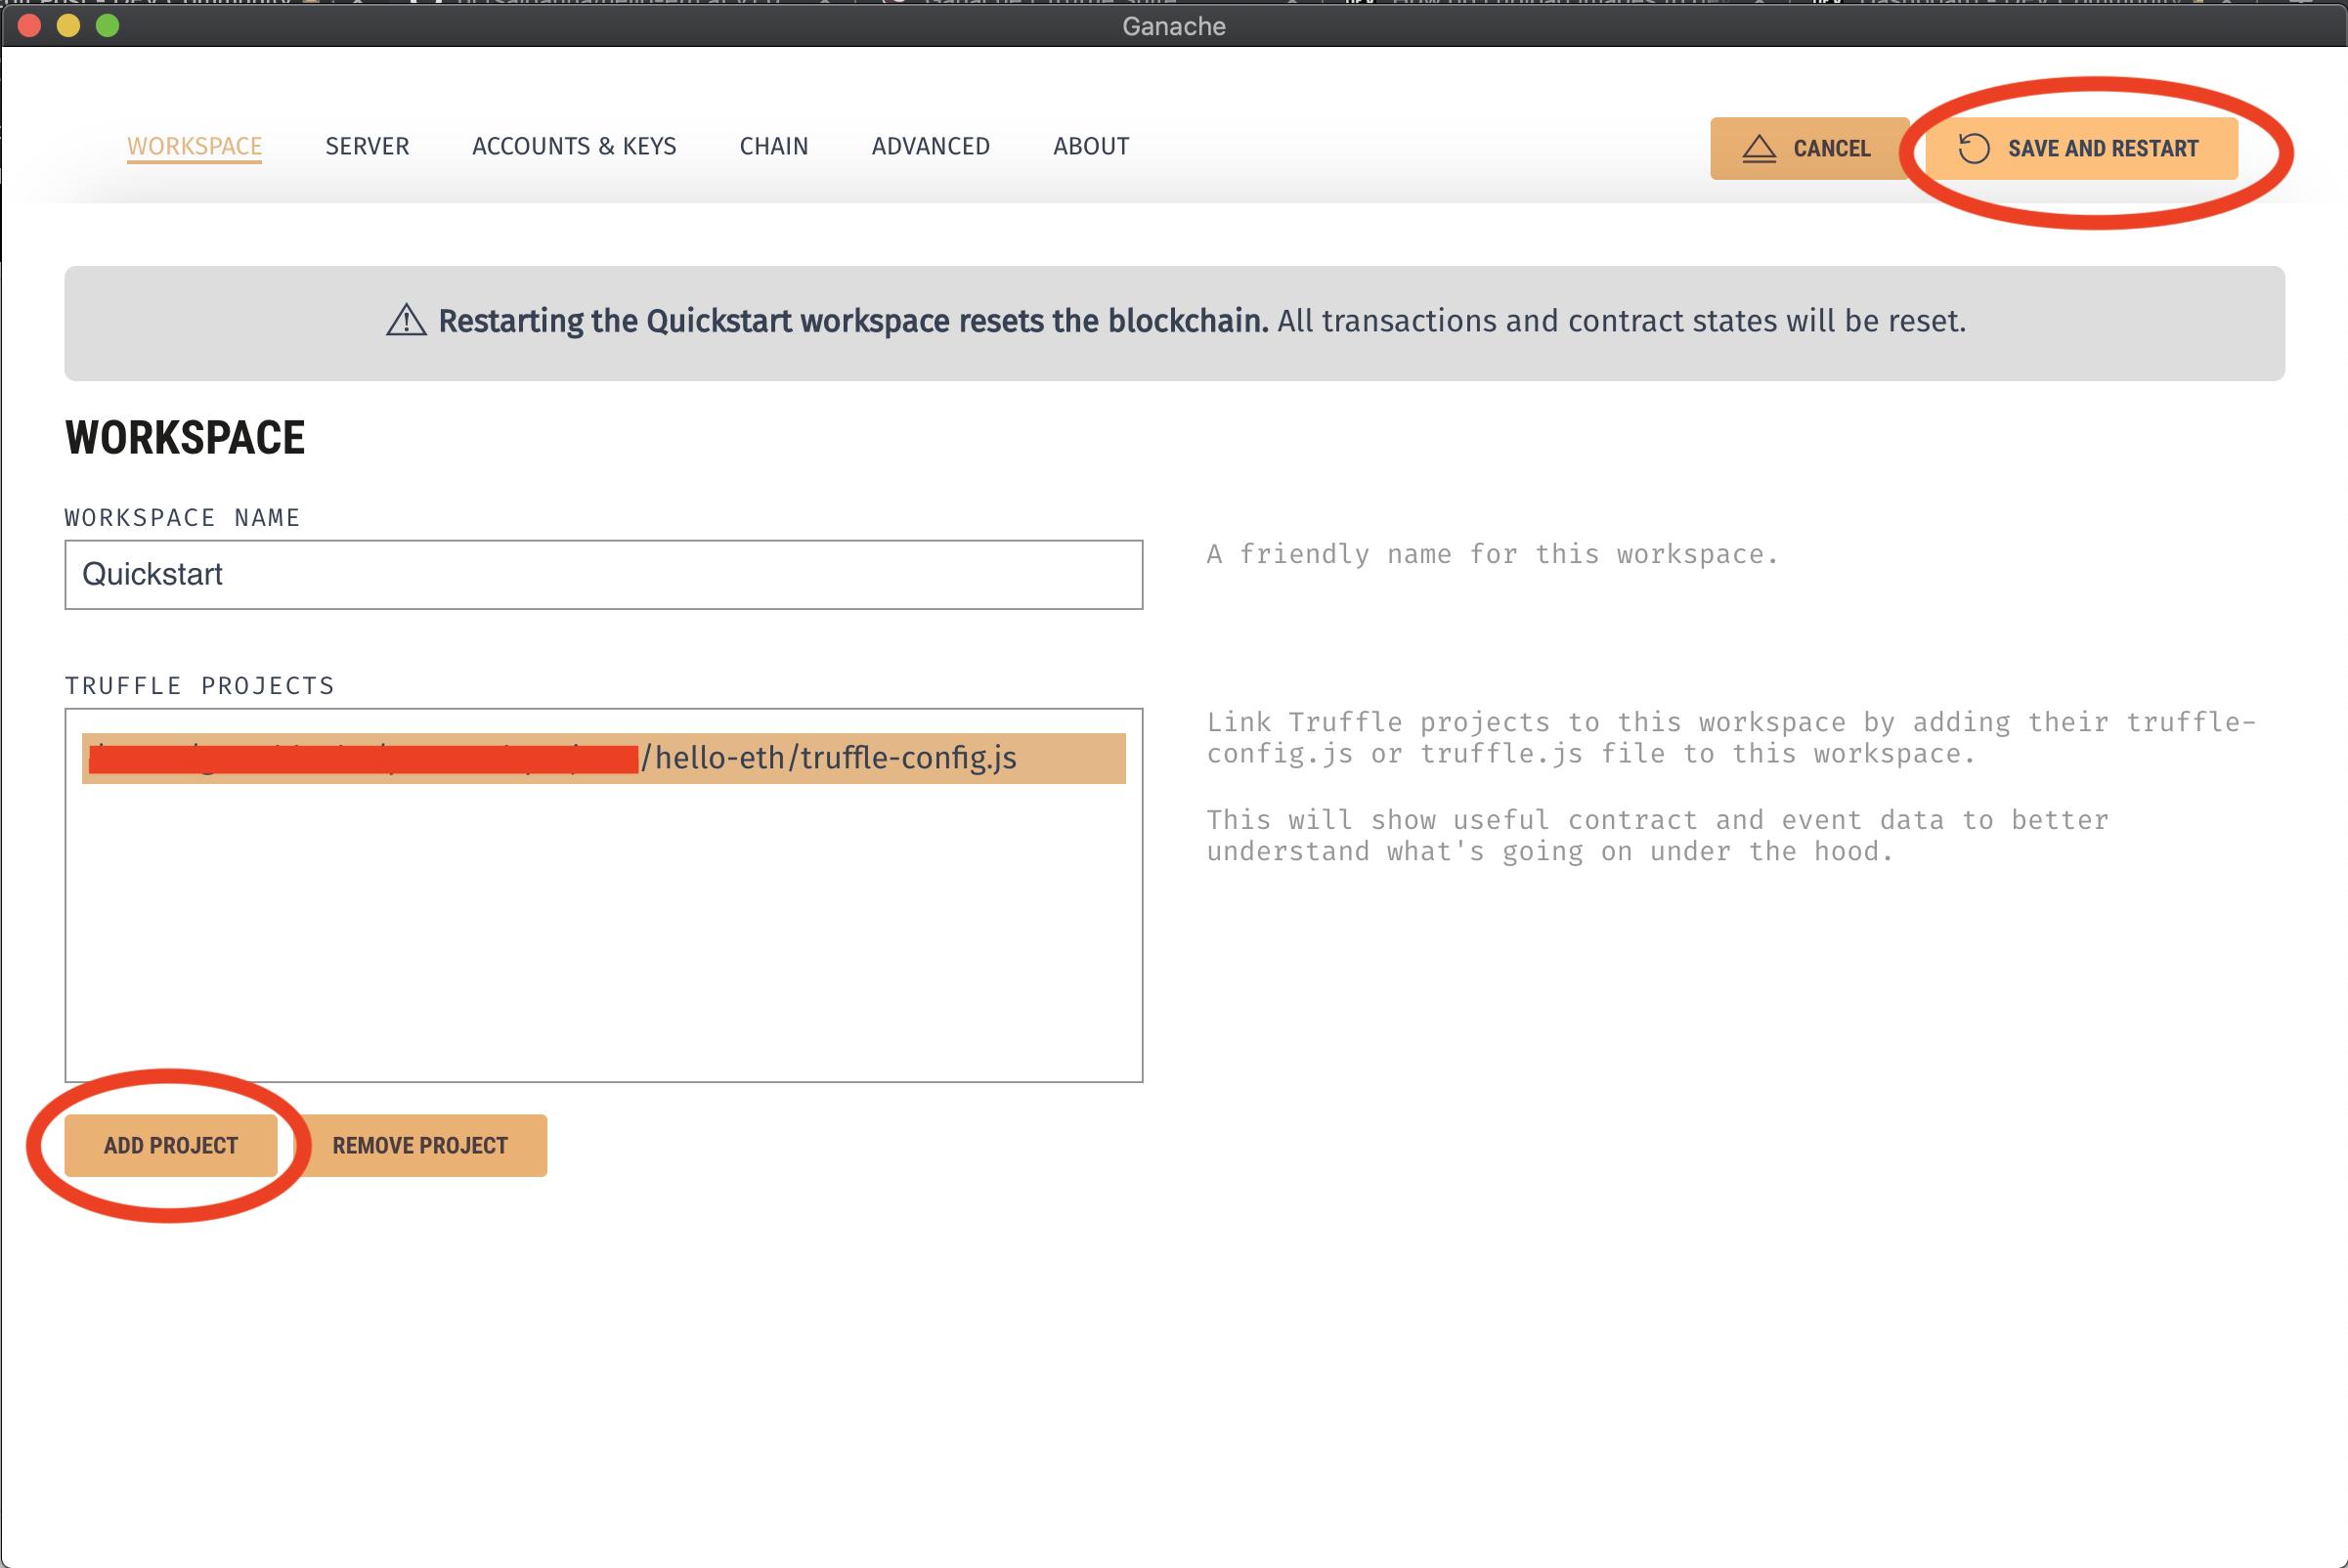 Add Project screen of Ganache